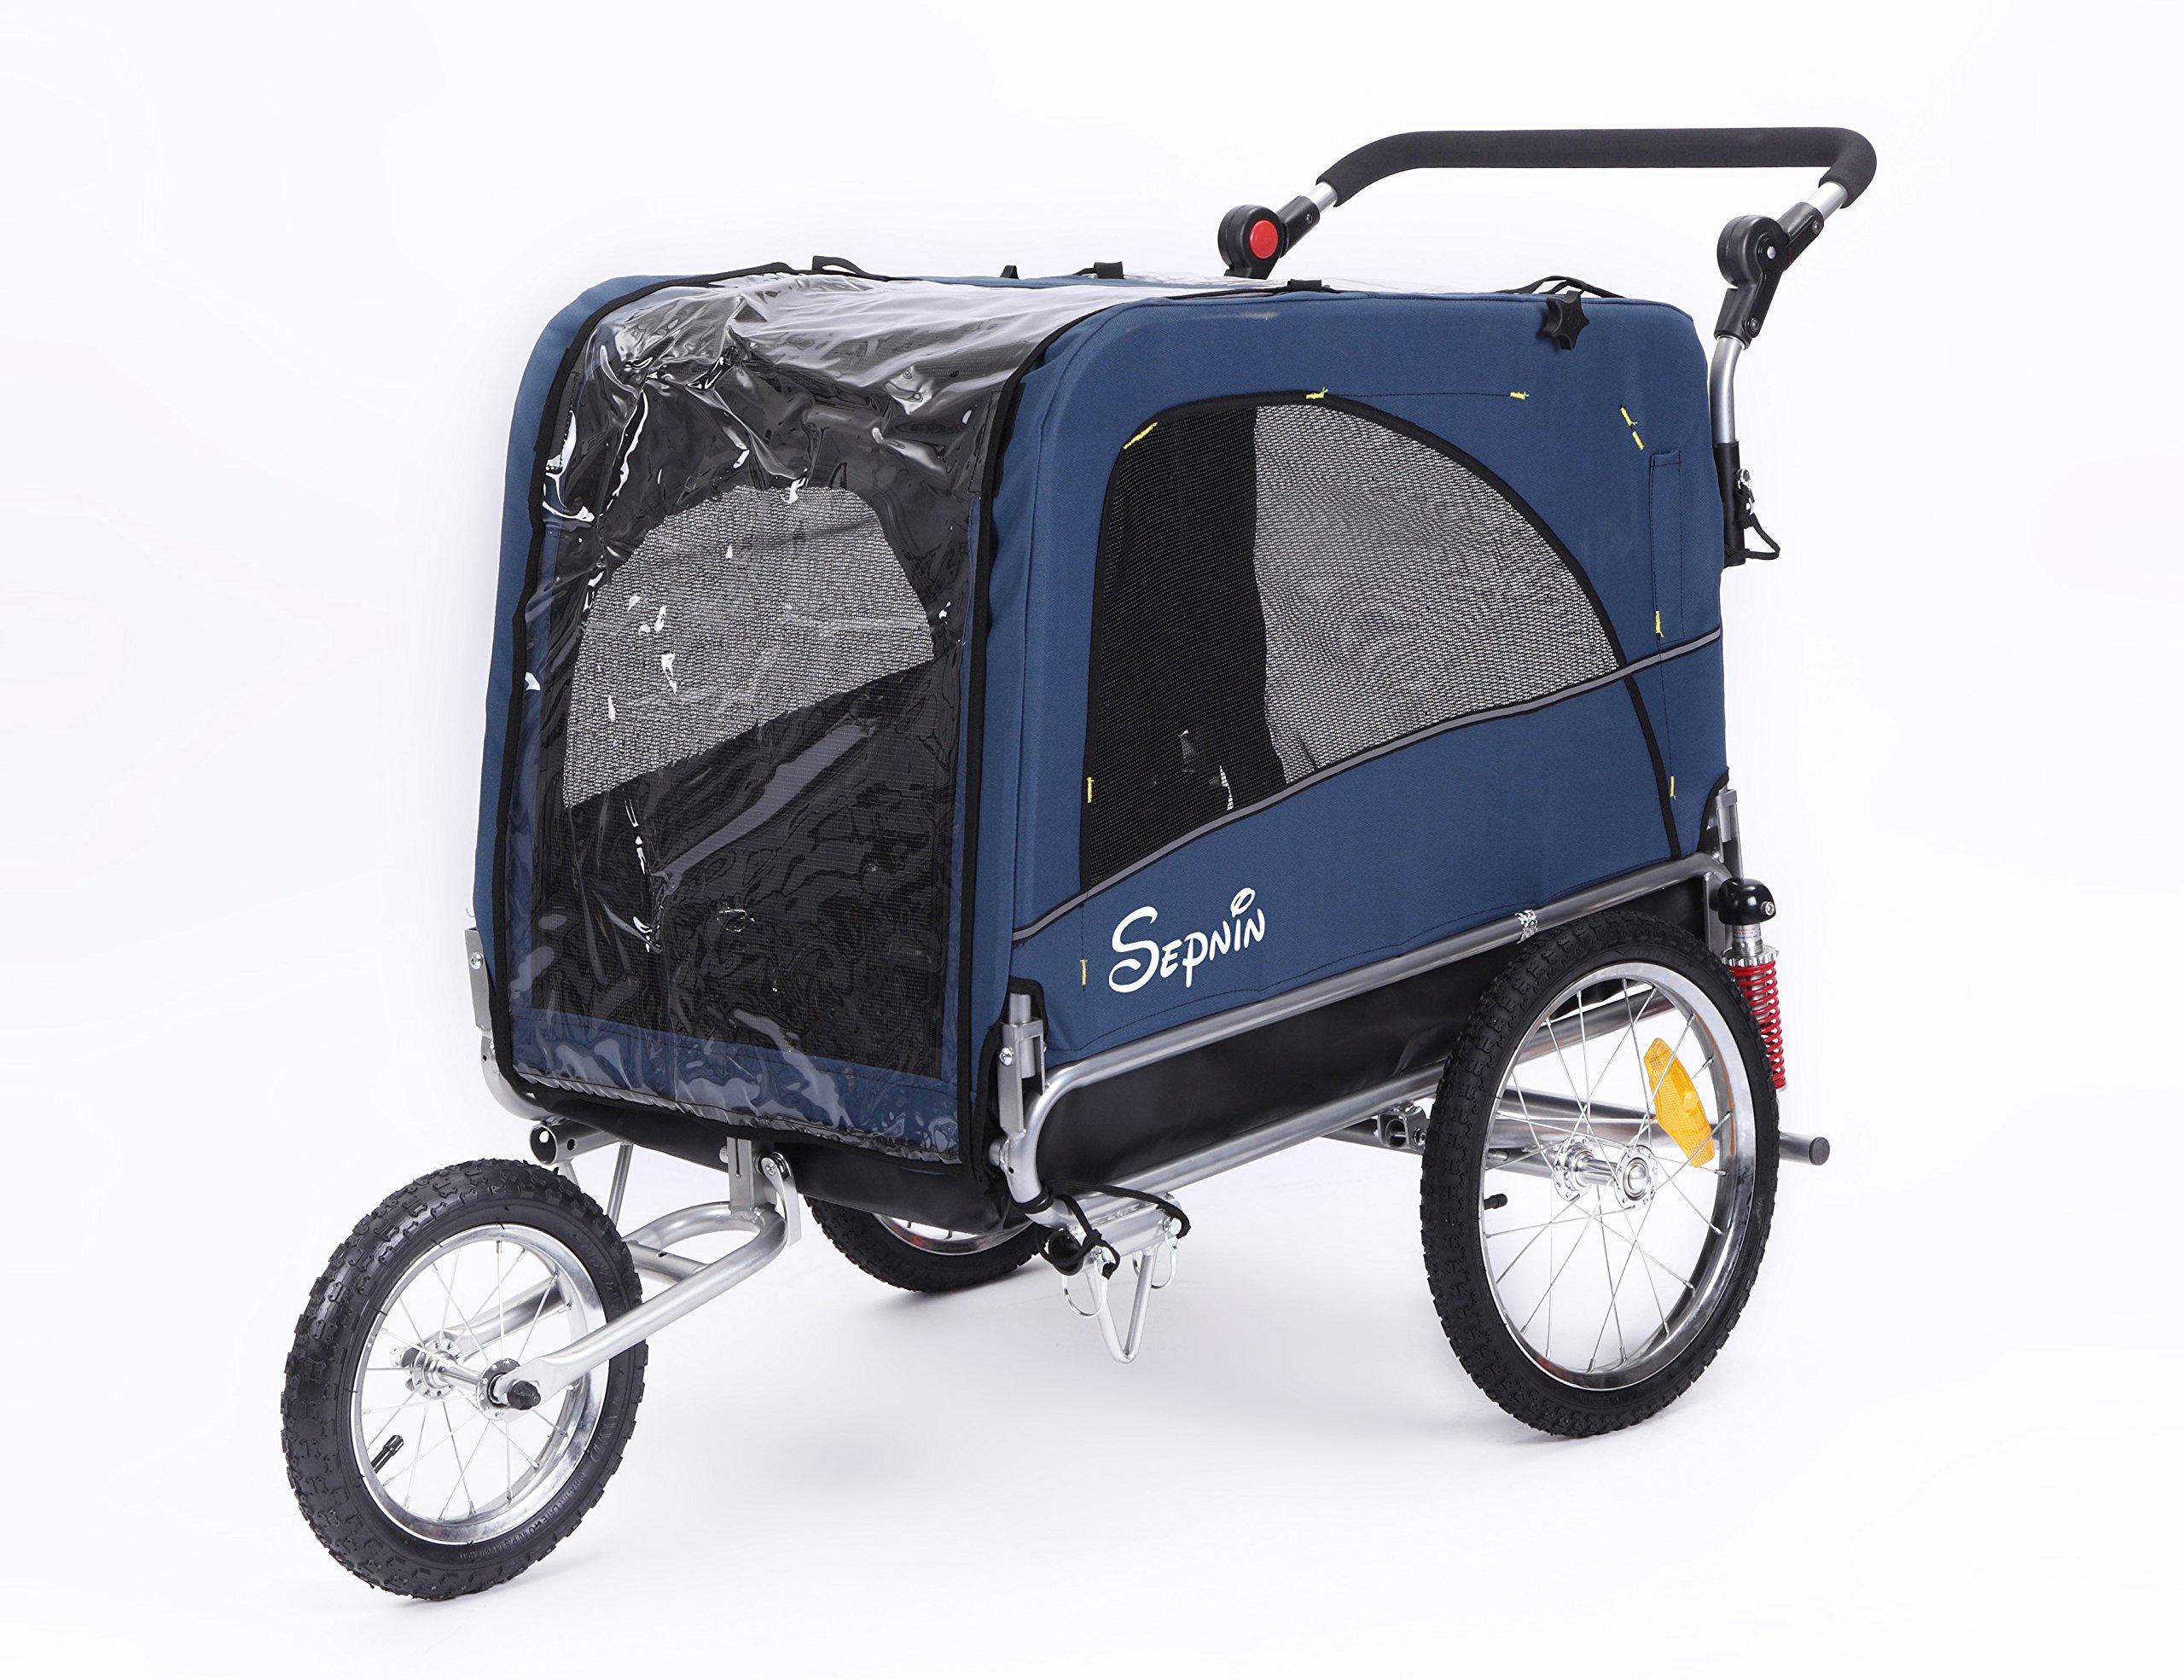 Sepnine & Leonpets Dog cart of 3 in 1 Luxury Large Sized Bike Trailer Bicycle Pet Trailer/Jogger/Dog Cage with Suspension 10308 (Blue/Black) by Sepnine